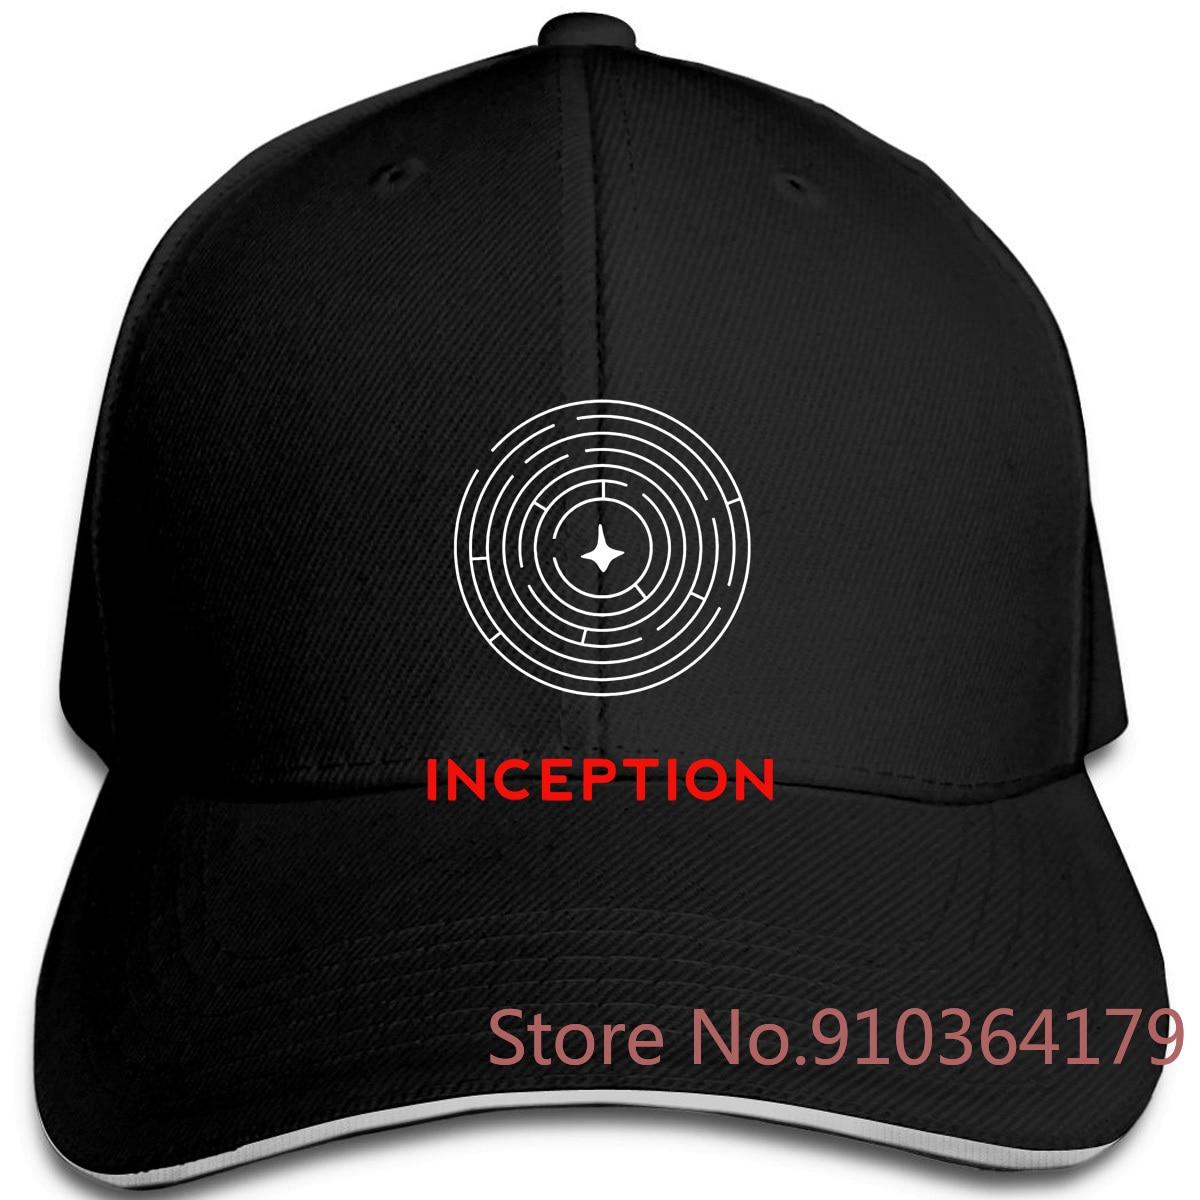 Edongquwe Cool Inception Estilo negro Swag ajustable gorras de béisbol hombres mujeres